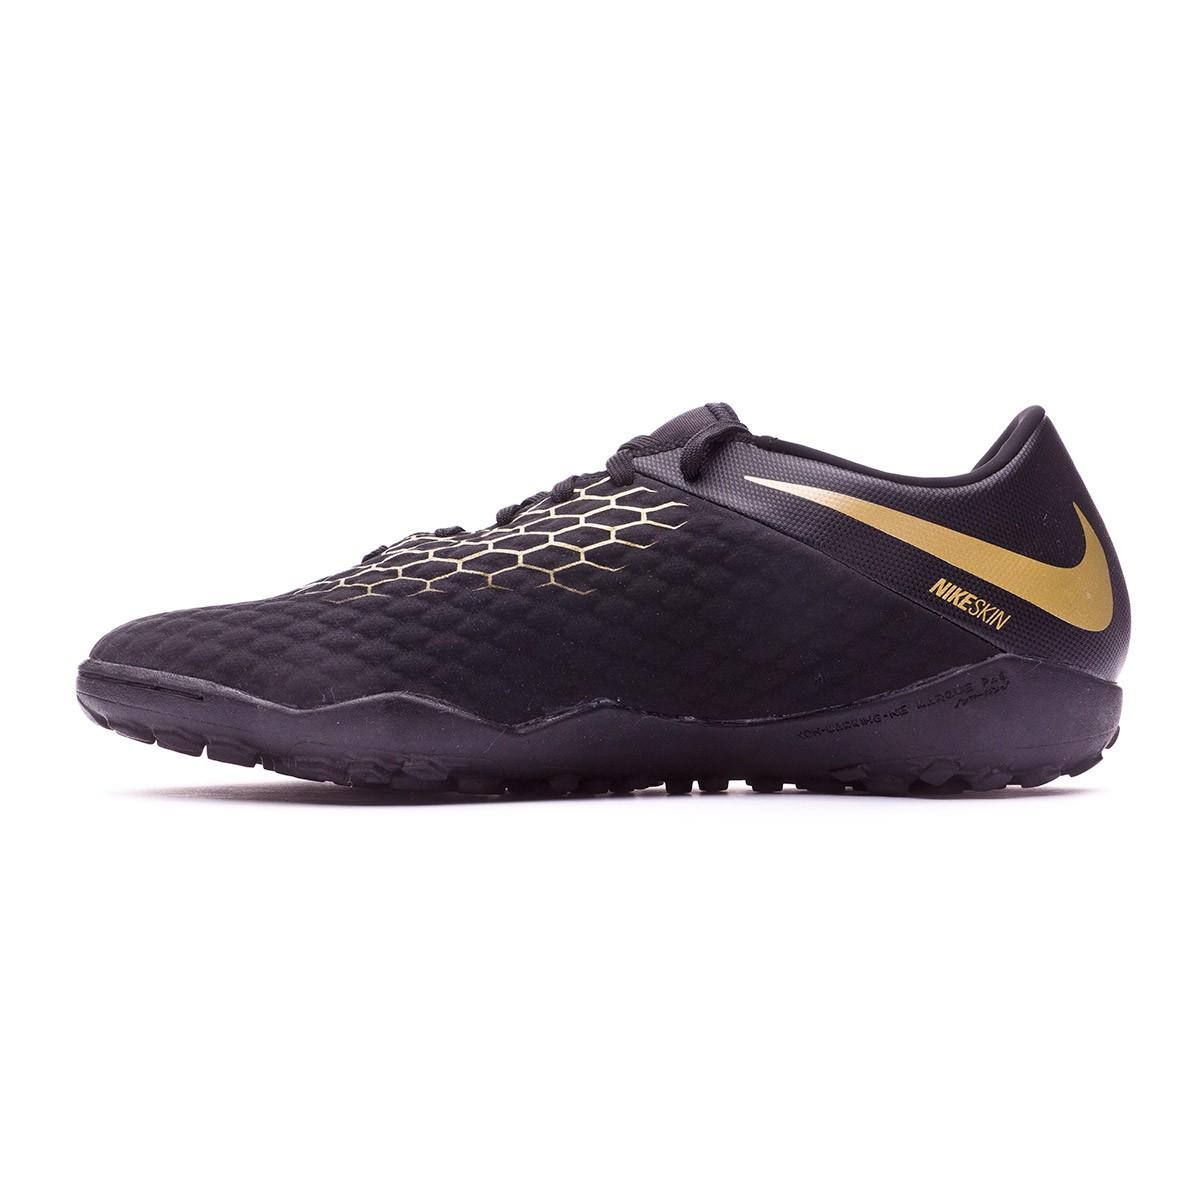 999075ea2cc ... shopping zapatilla nike hypervenom phantomx iii academy turf black  metallic vivid gold soloporteros es ahora fútbol